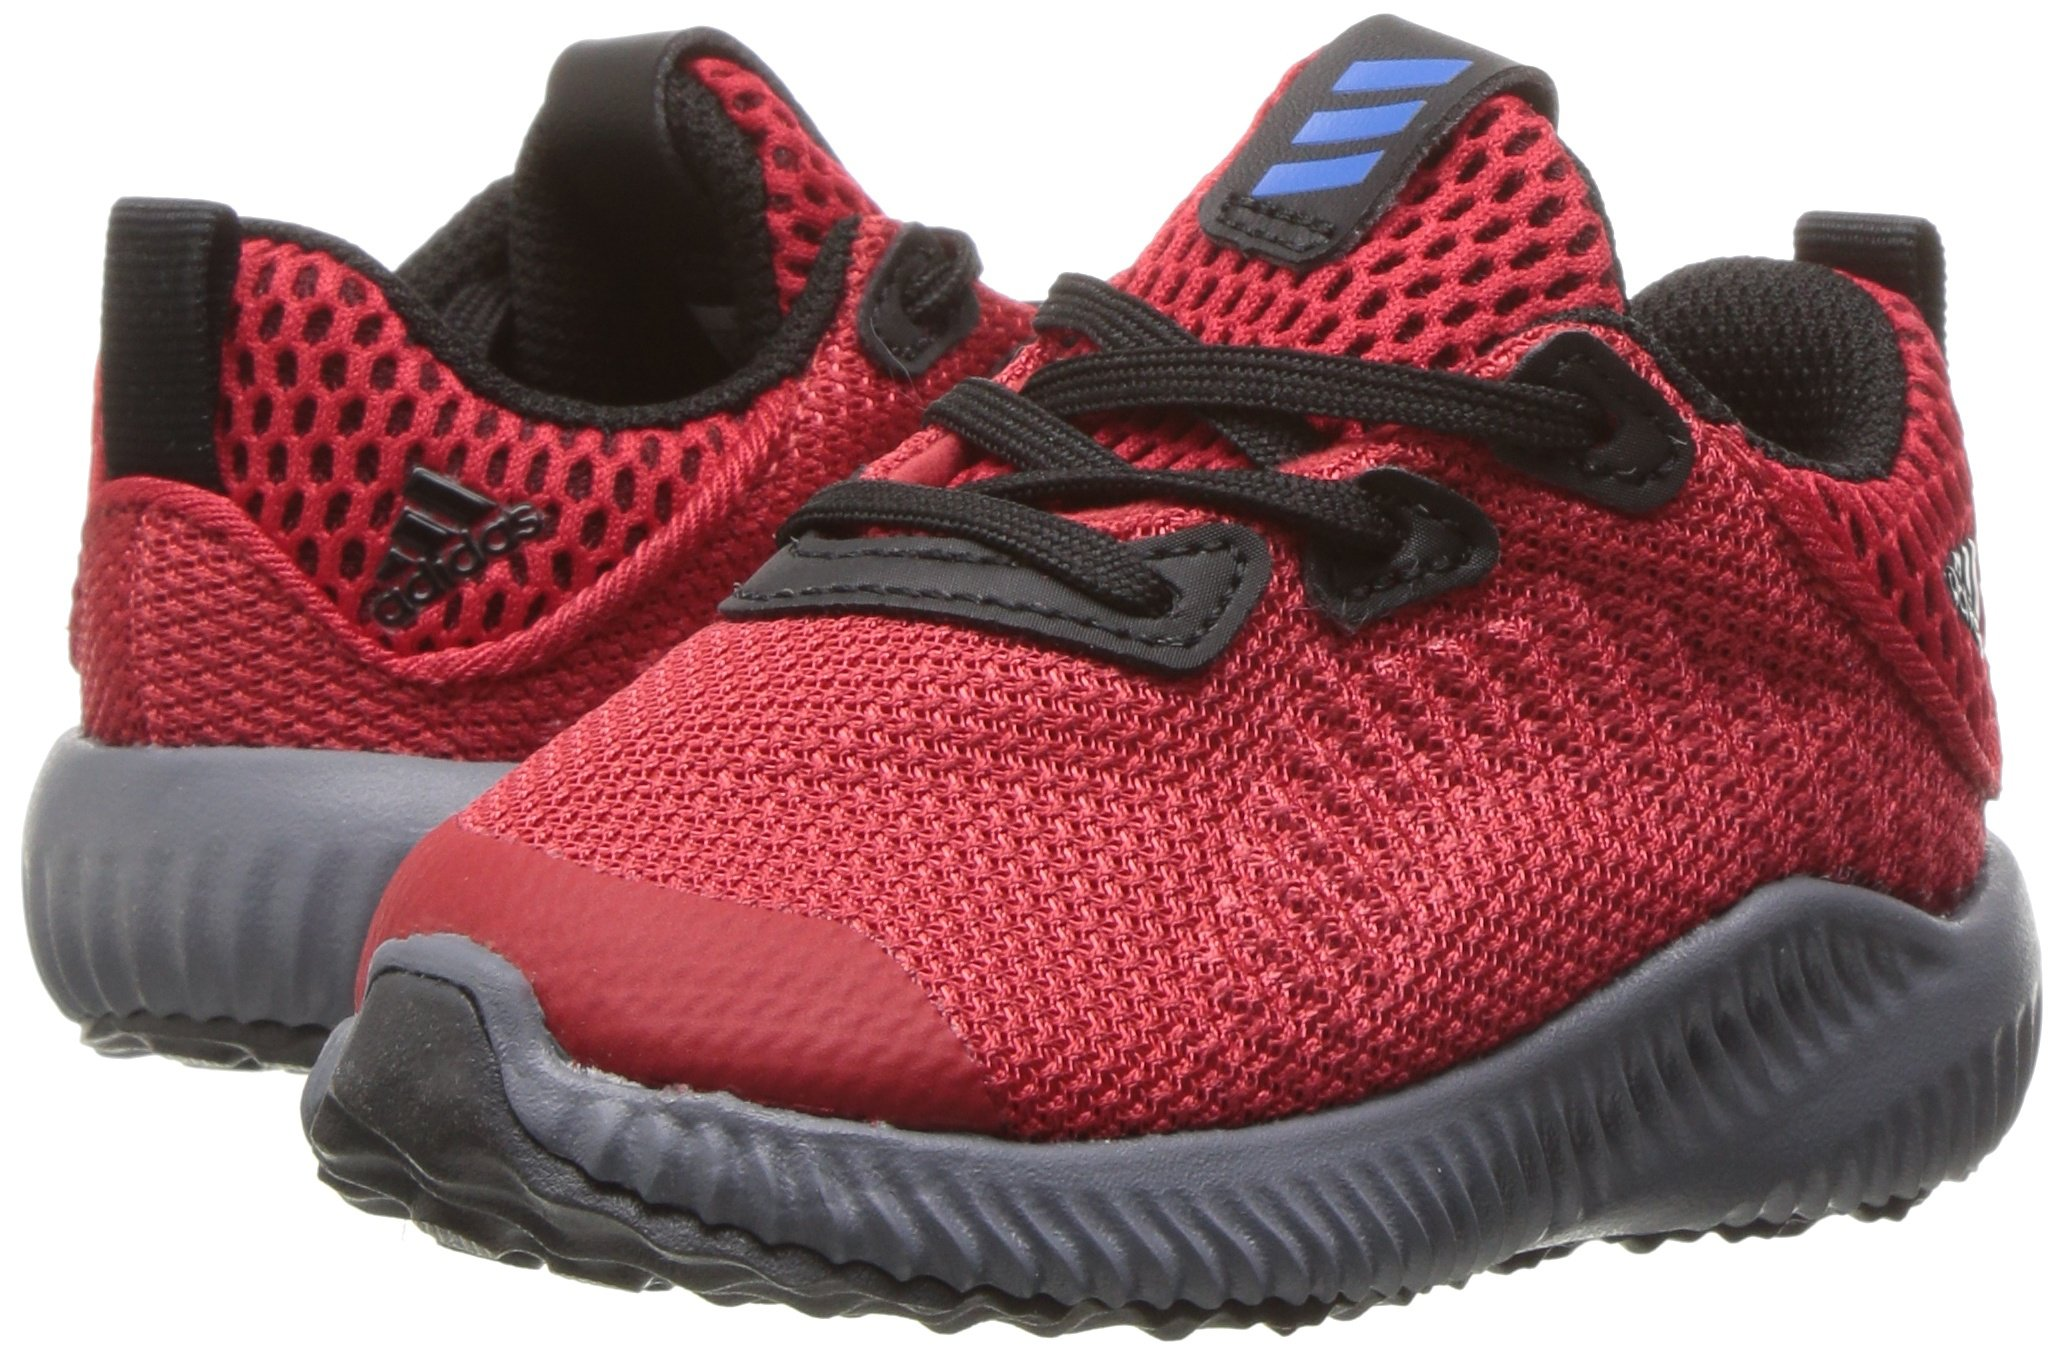 adidas Kids' Alphabounce Sneaker, Scarlet/Satellite/Black, 8 M US Toddler by adidas (Image #6)